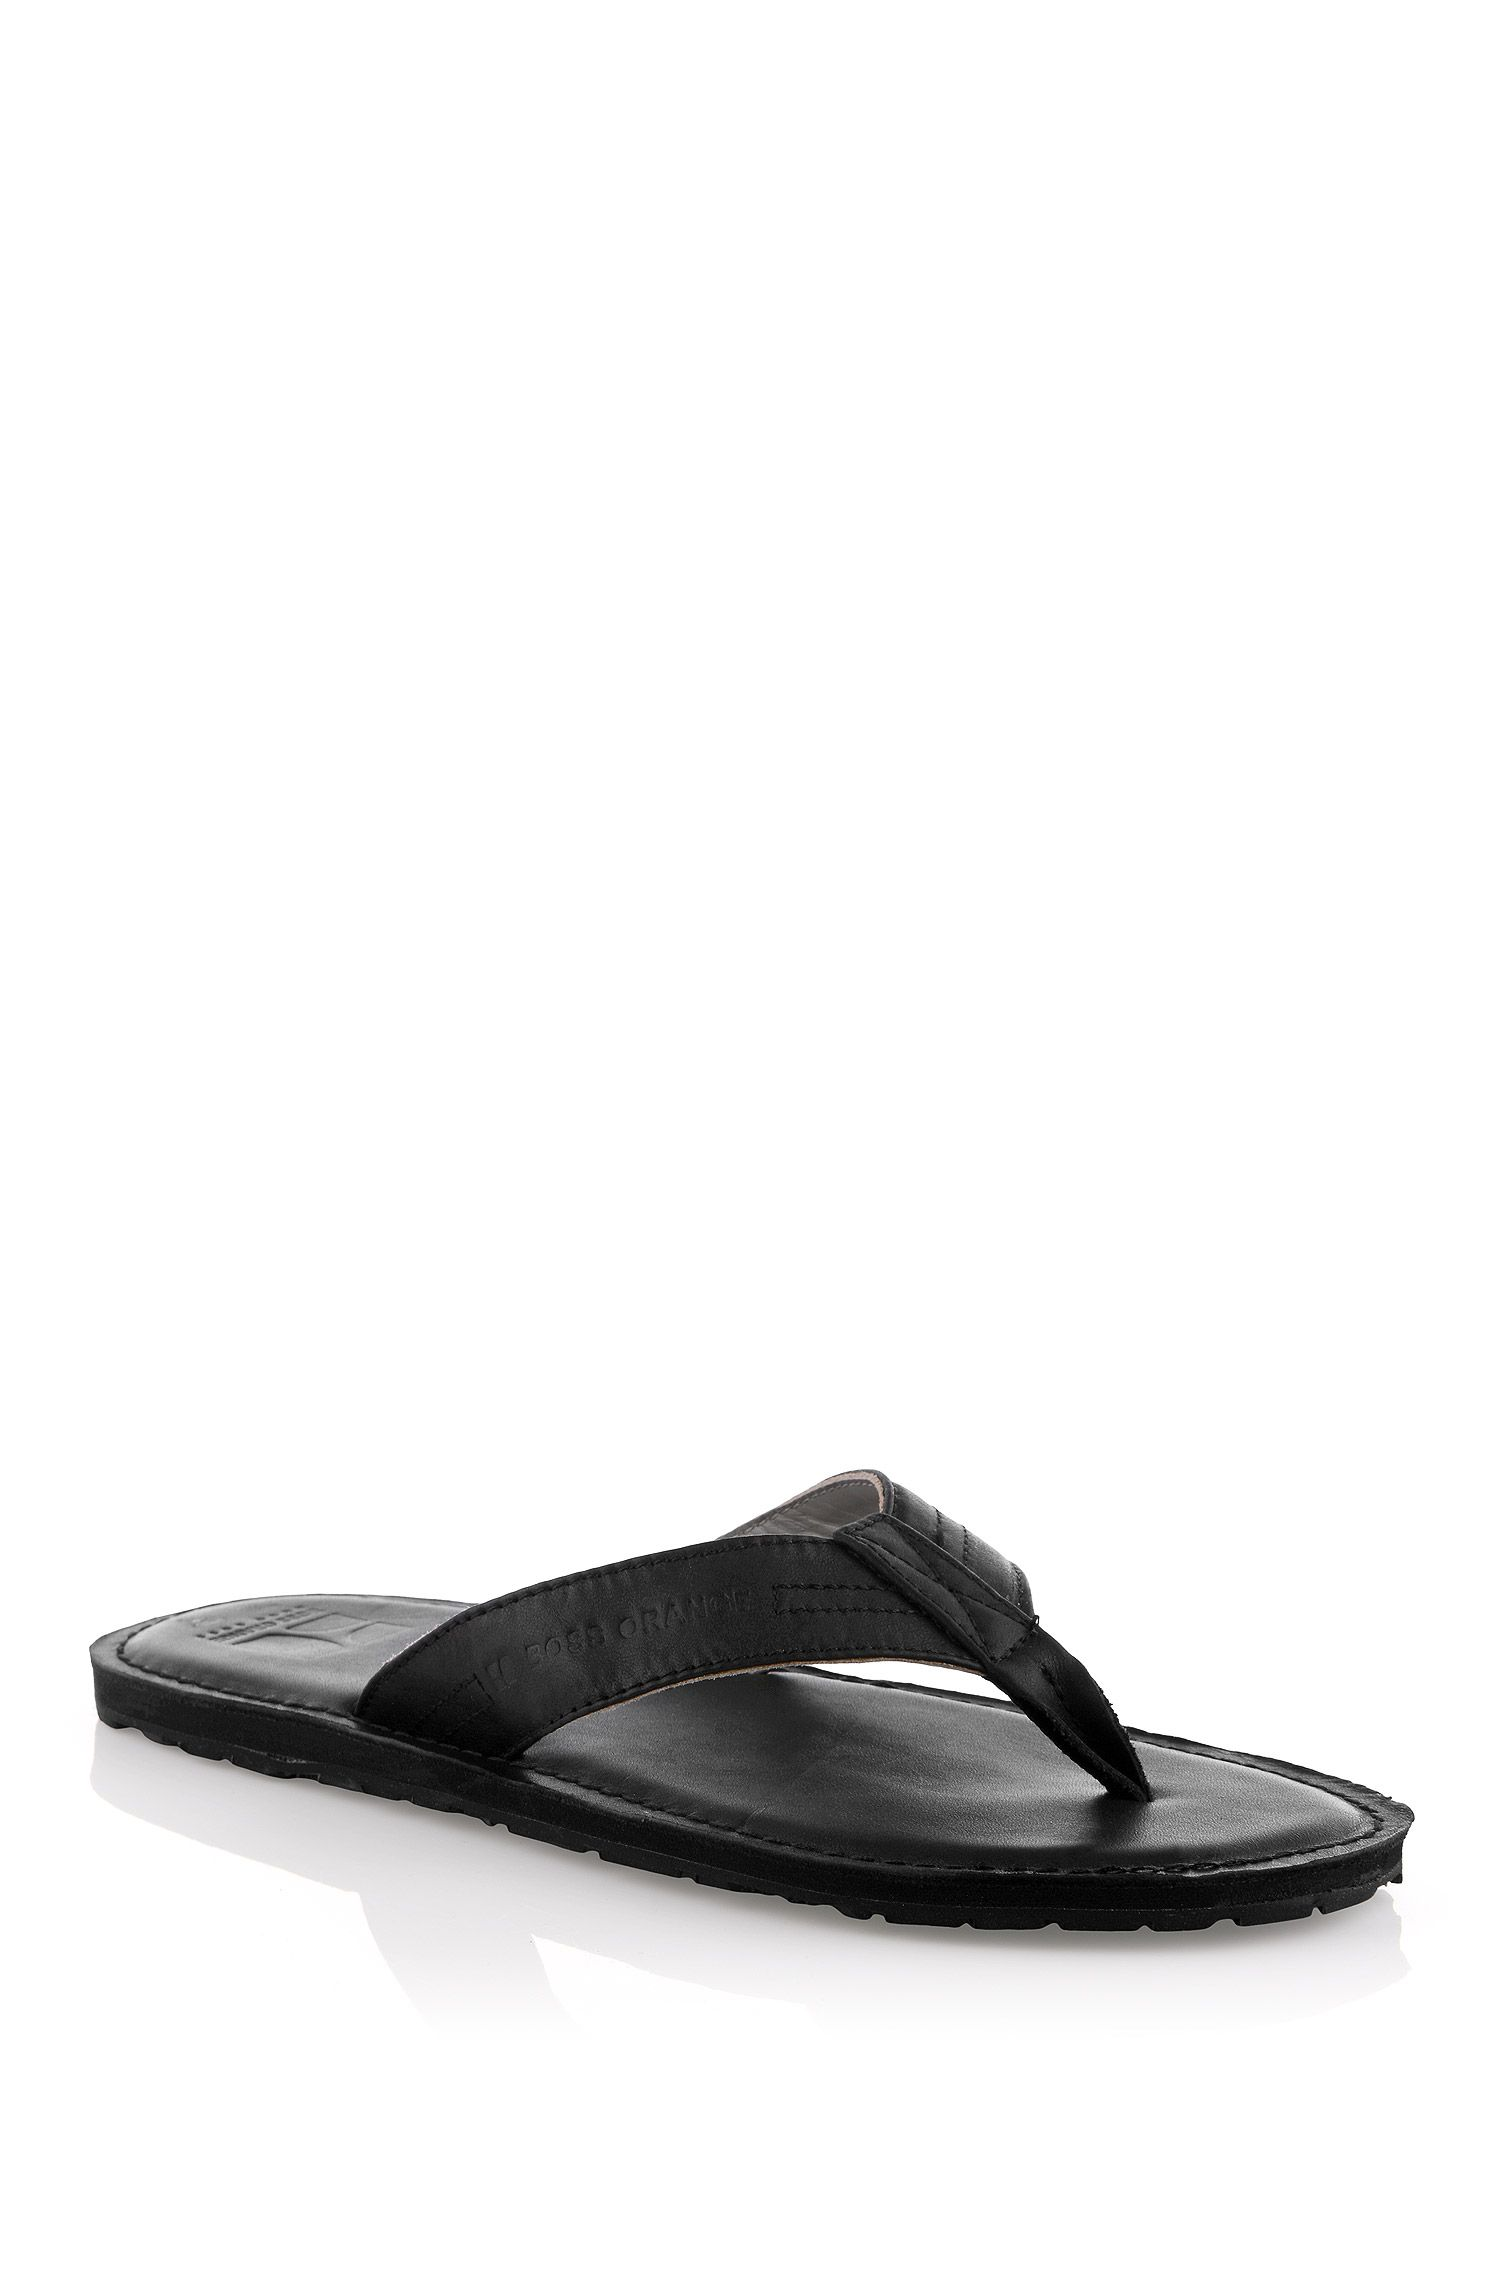 Sandales à entredoigts et bride en cuir, Longio